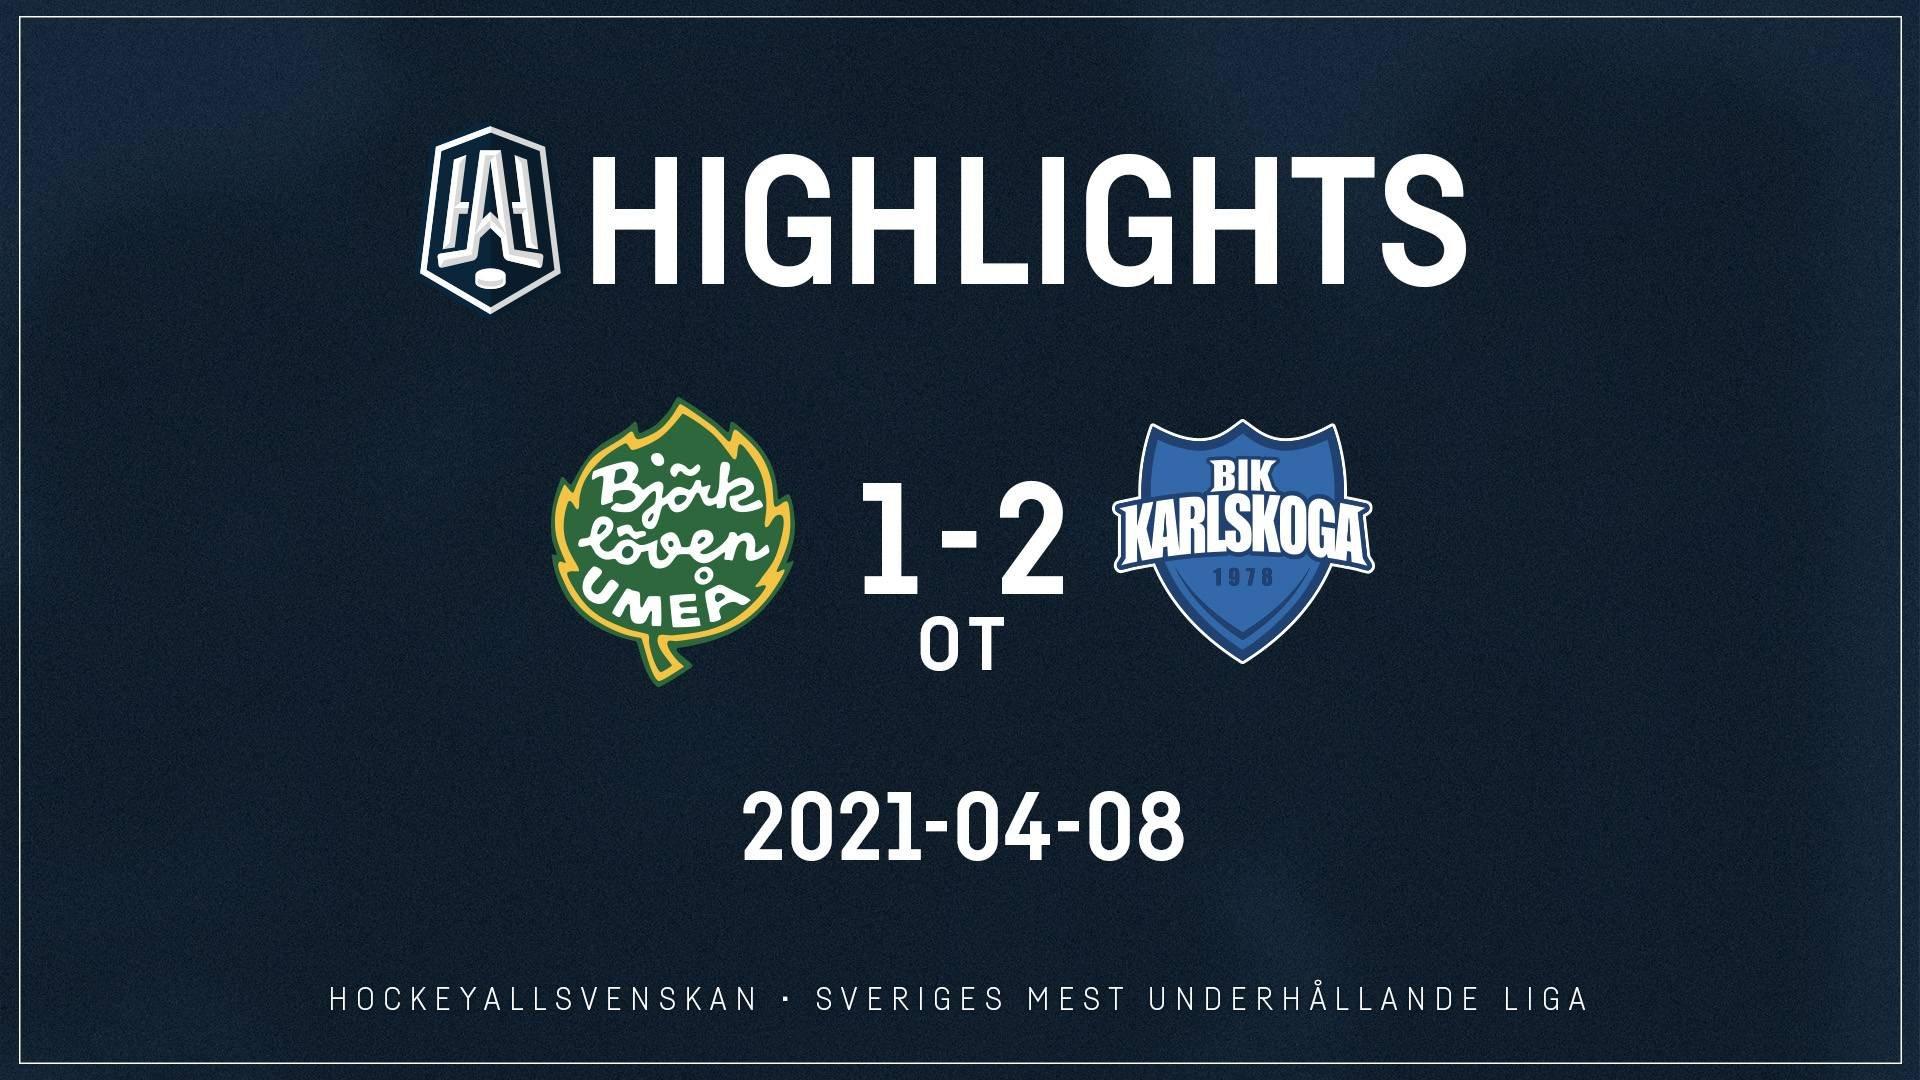 2021-04-08 Björklöven - Karlskoga 1-2 (OT)